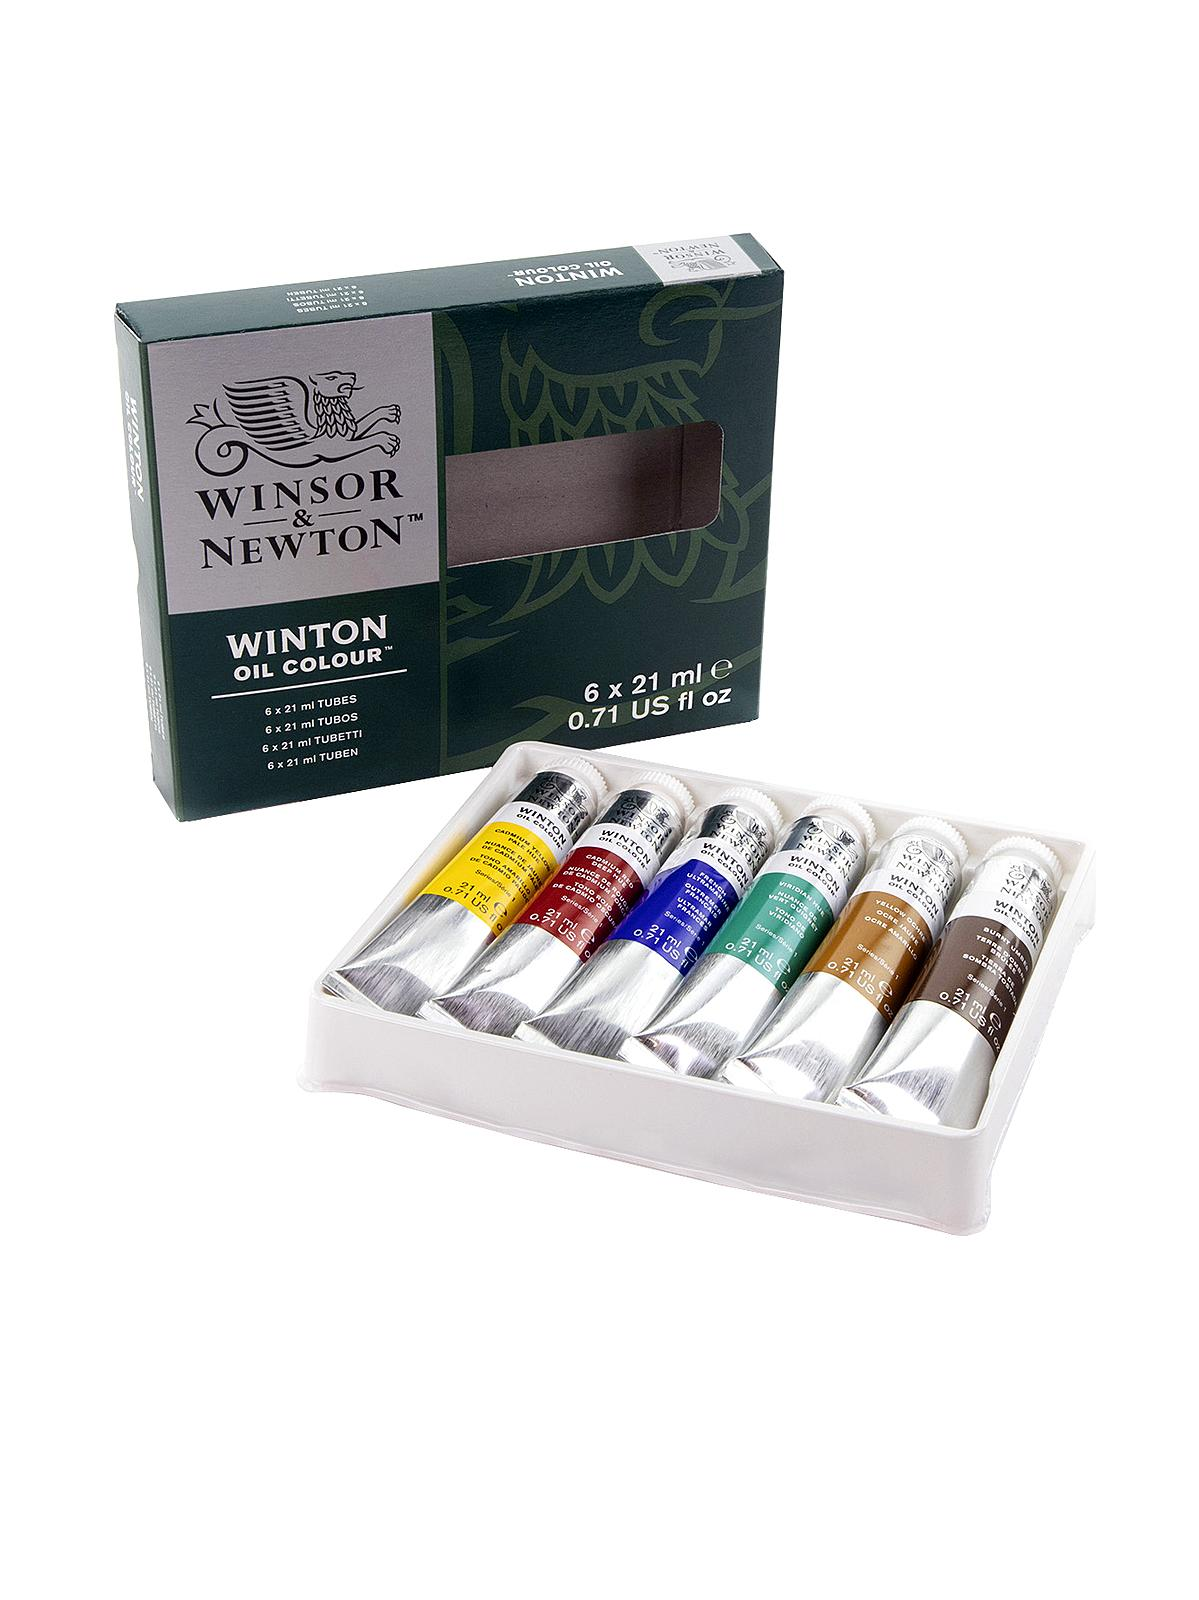 Winton Oil Colour Intro Set